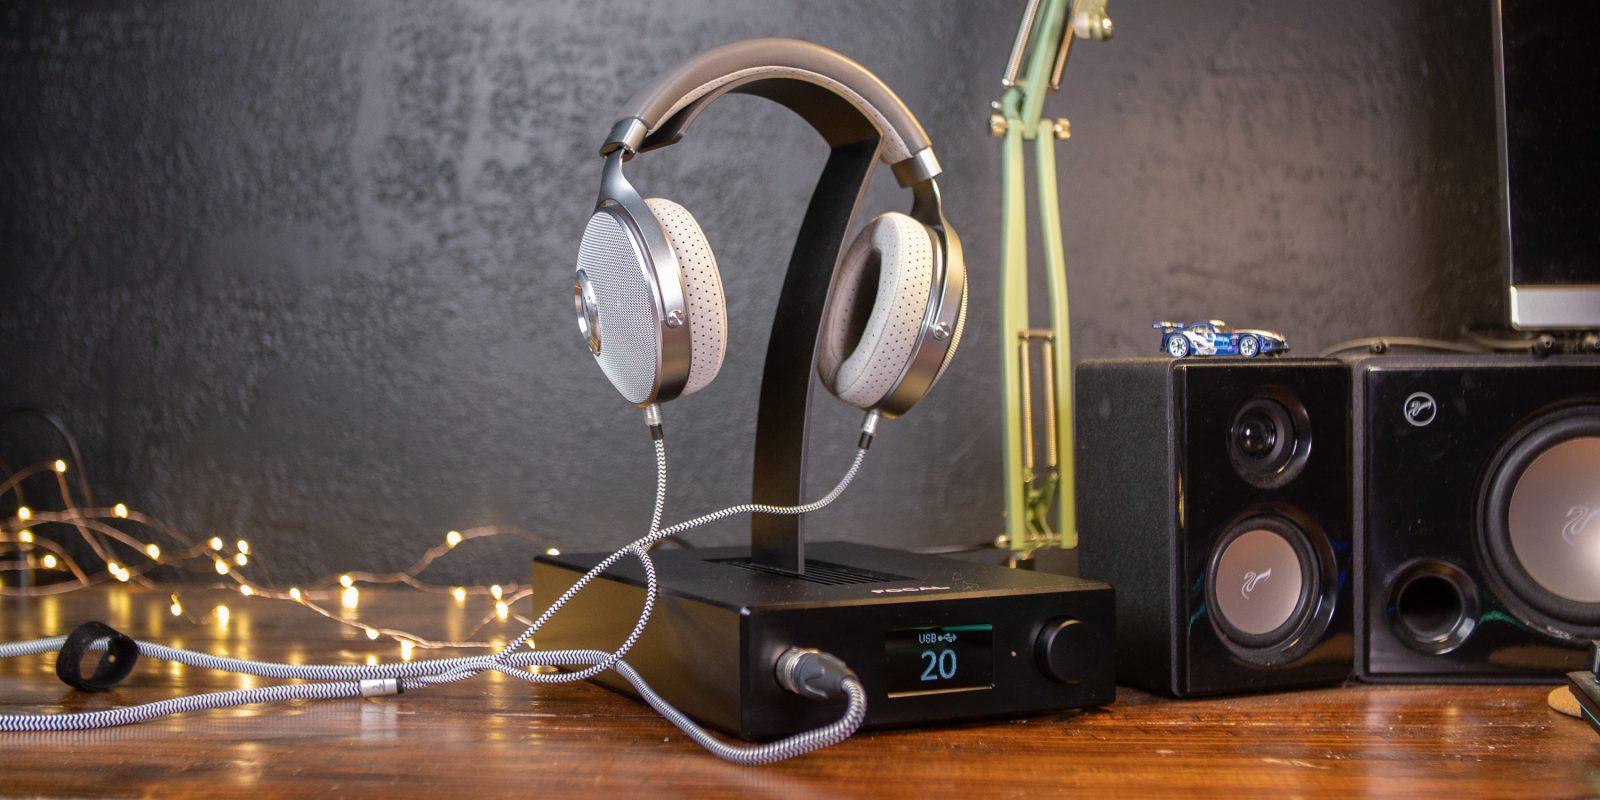 Focal Arche Headphone Amp/DAC Review: Premium sound for Hi-Fi headphones [Video]